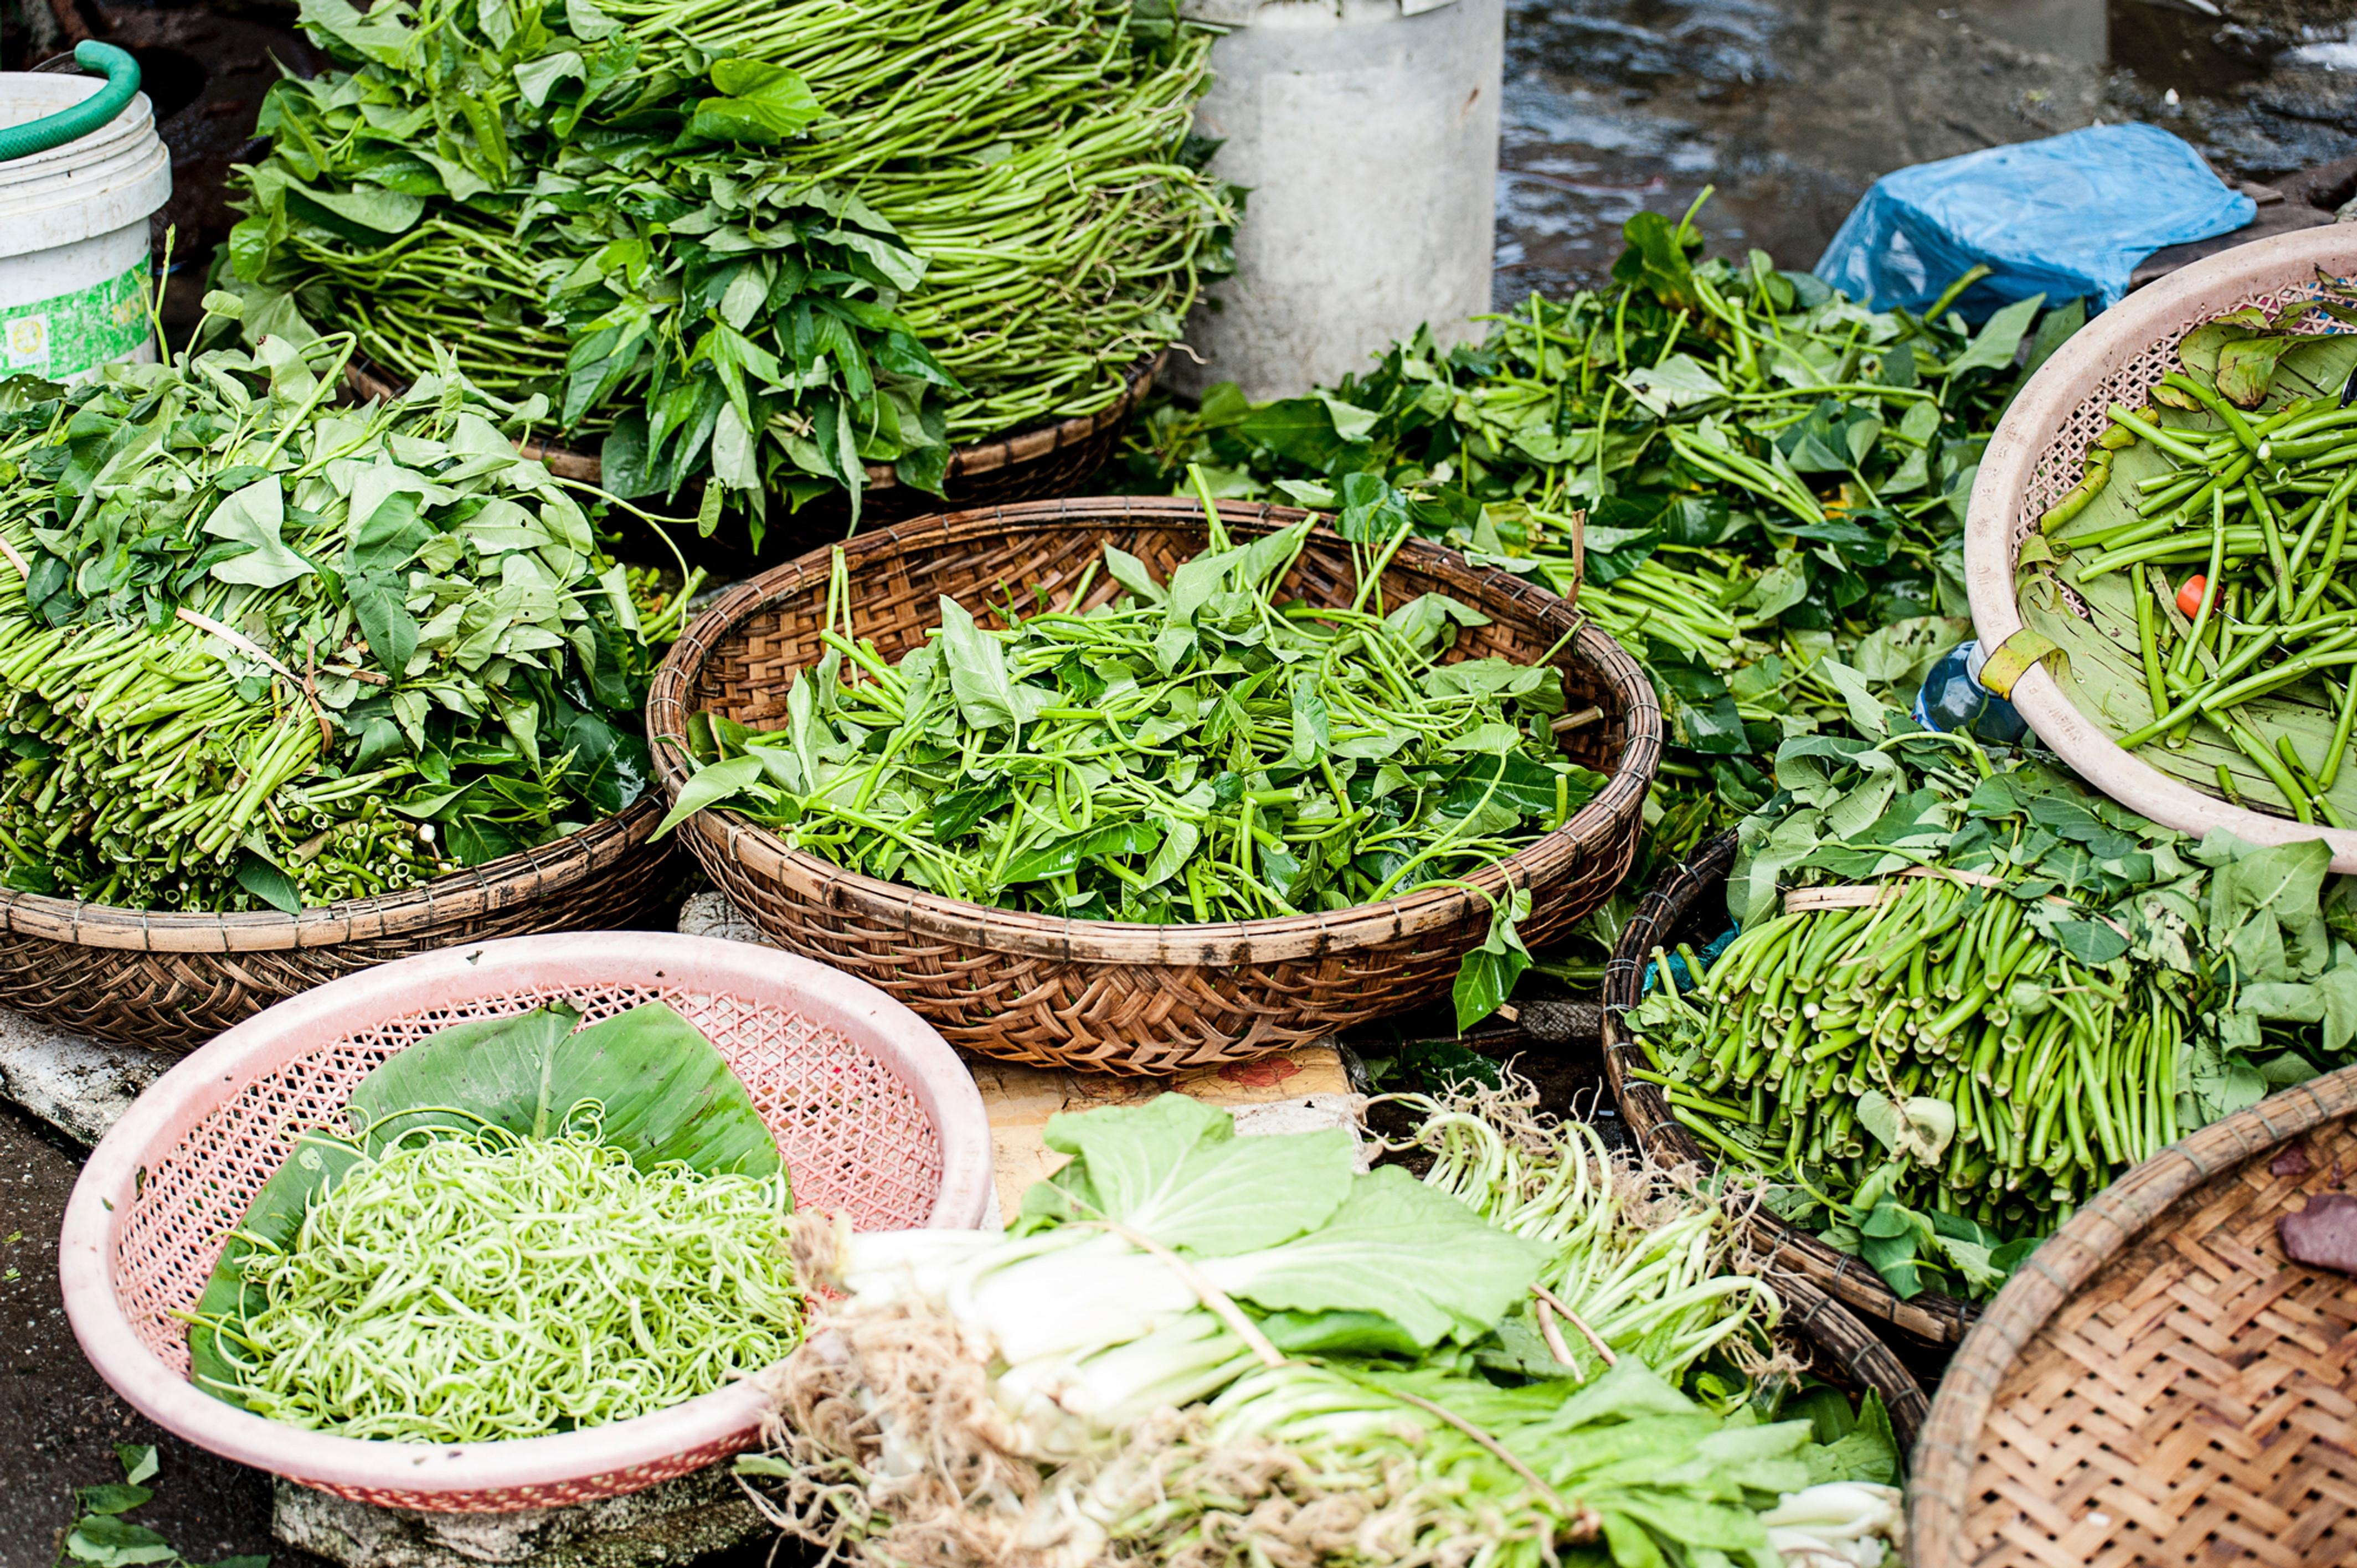 Herbalist & Nutrition Support